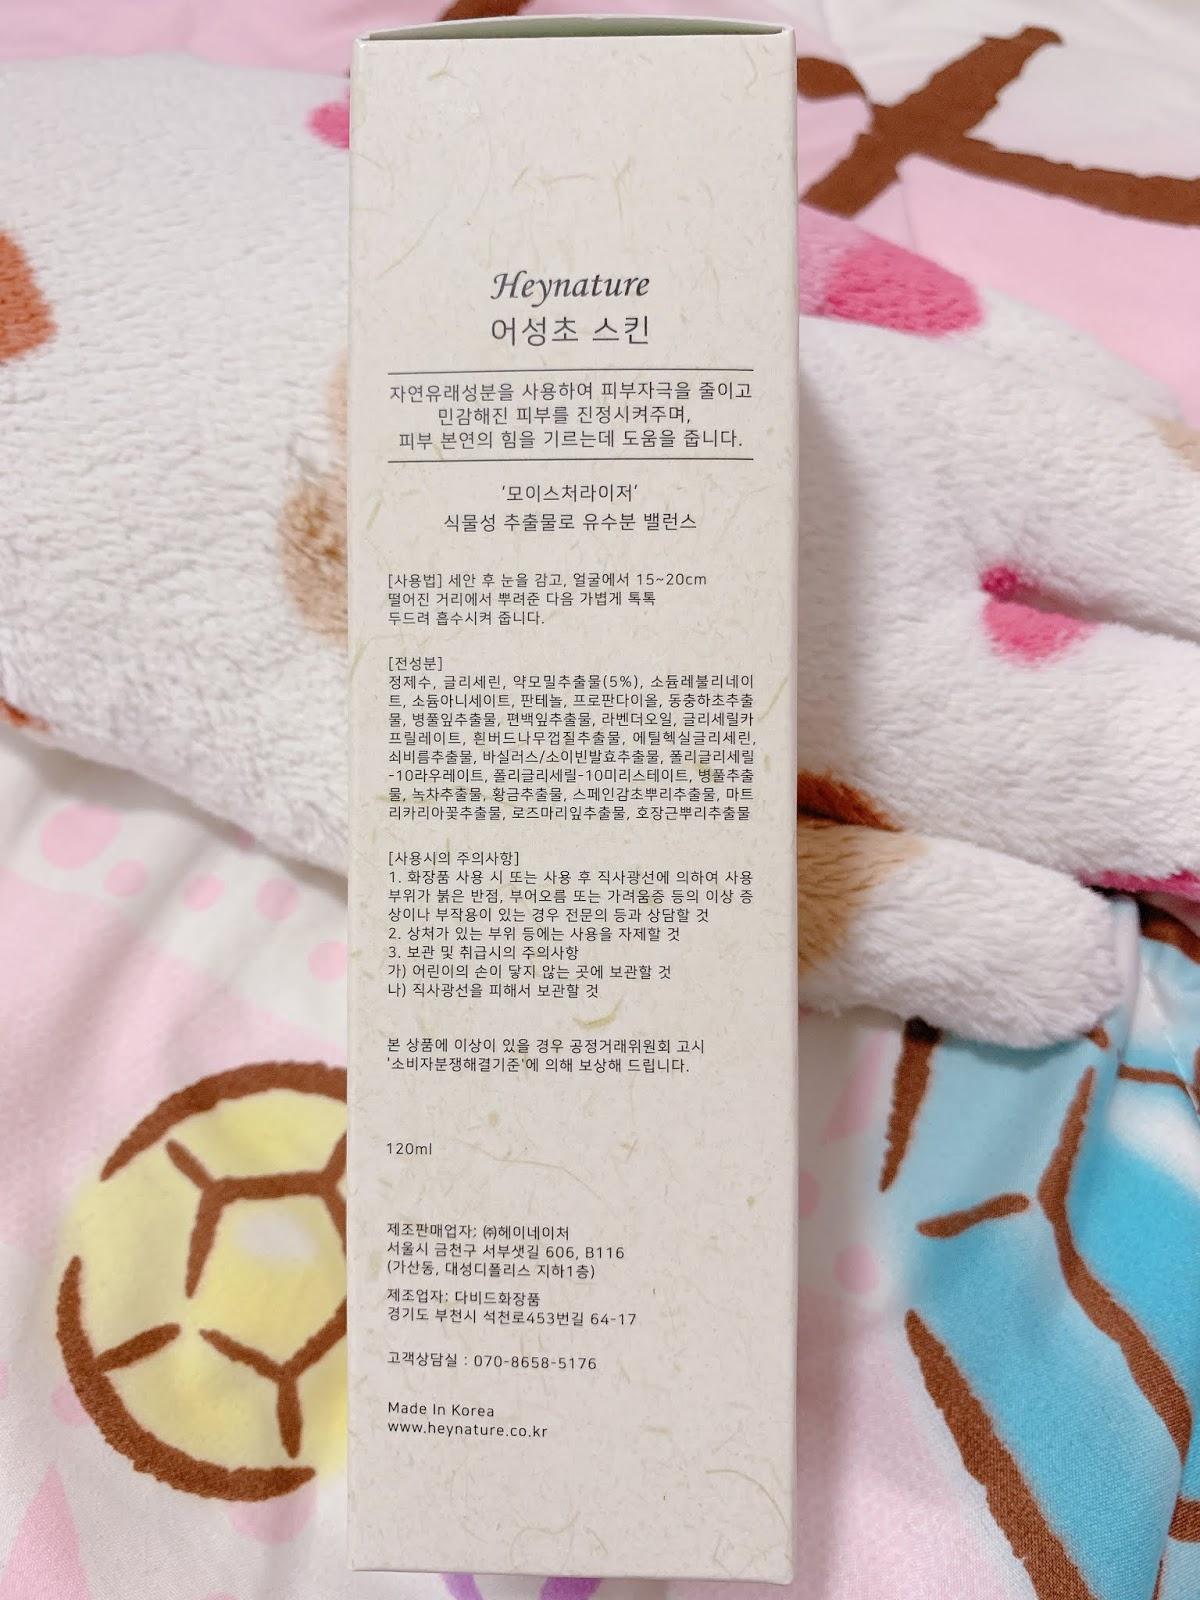 4061c045cde Beautylife HK - ◕◡◕舒緩鎮靜‧保濕修復♥Heynature魚腥草系列 ...